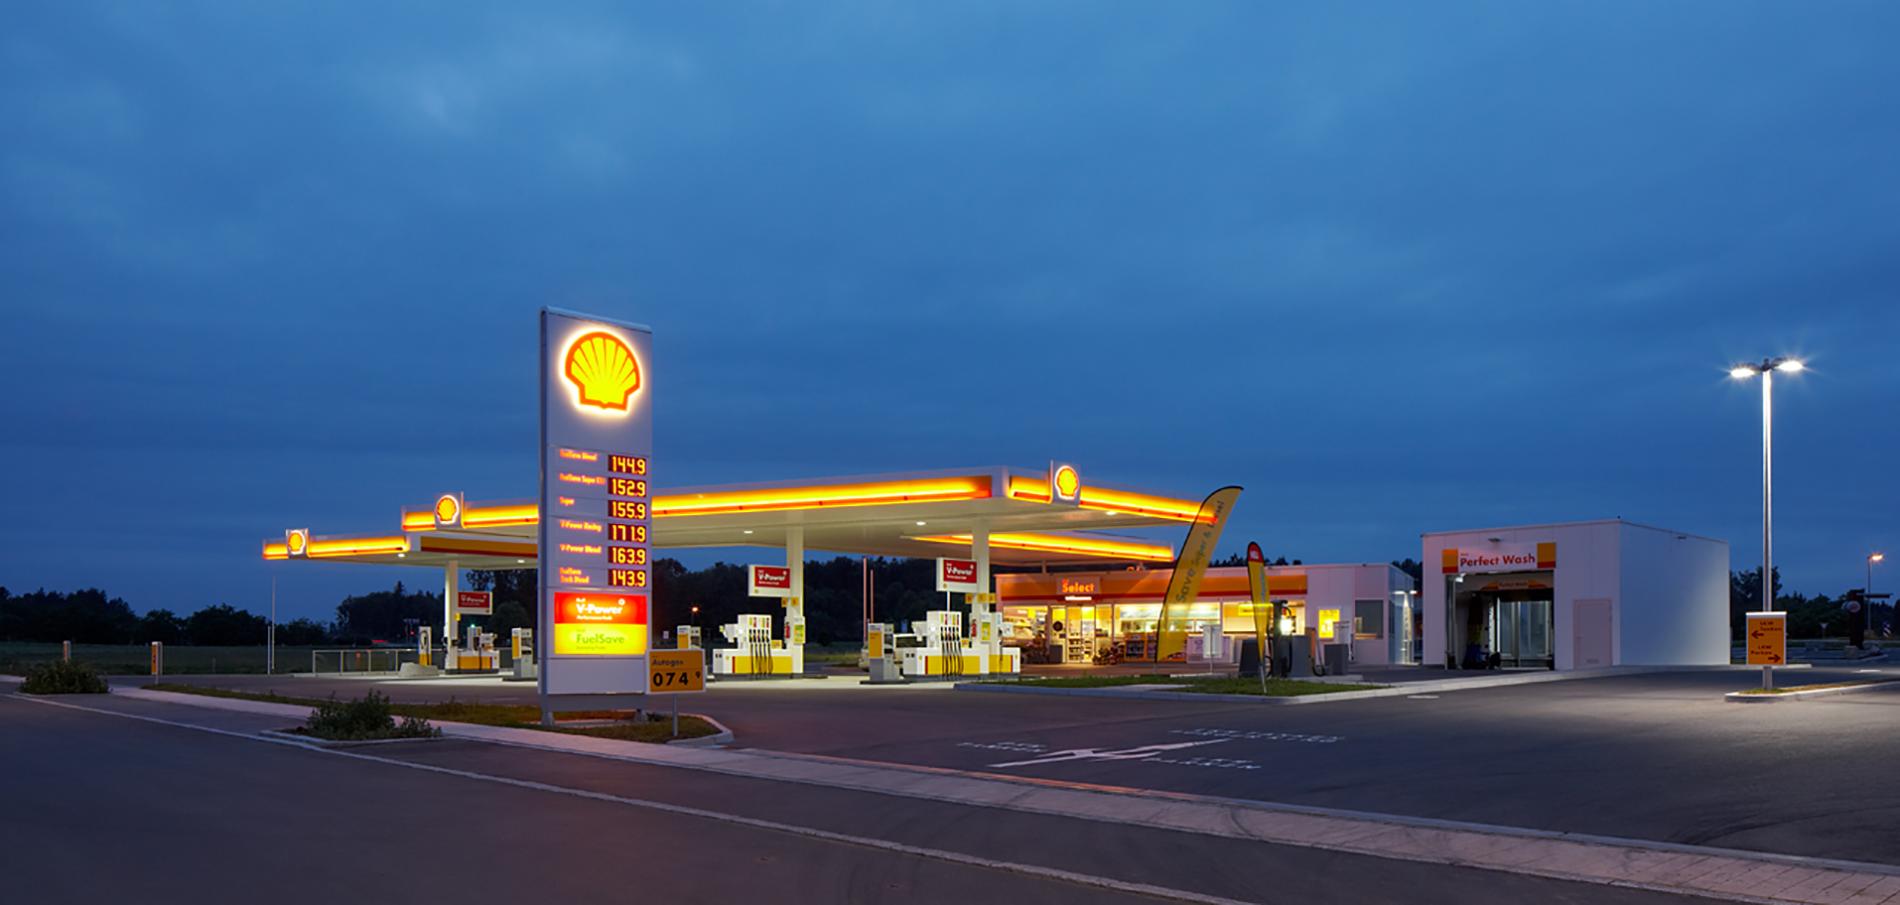 tankstellenanlagen-shell